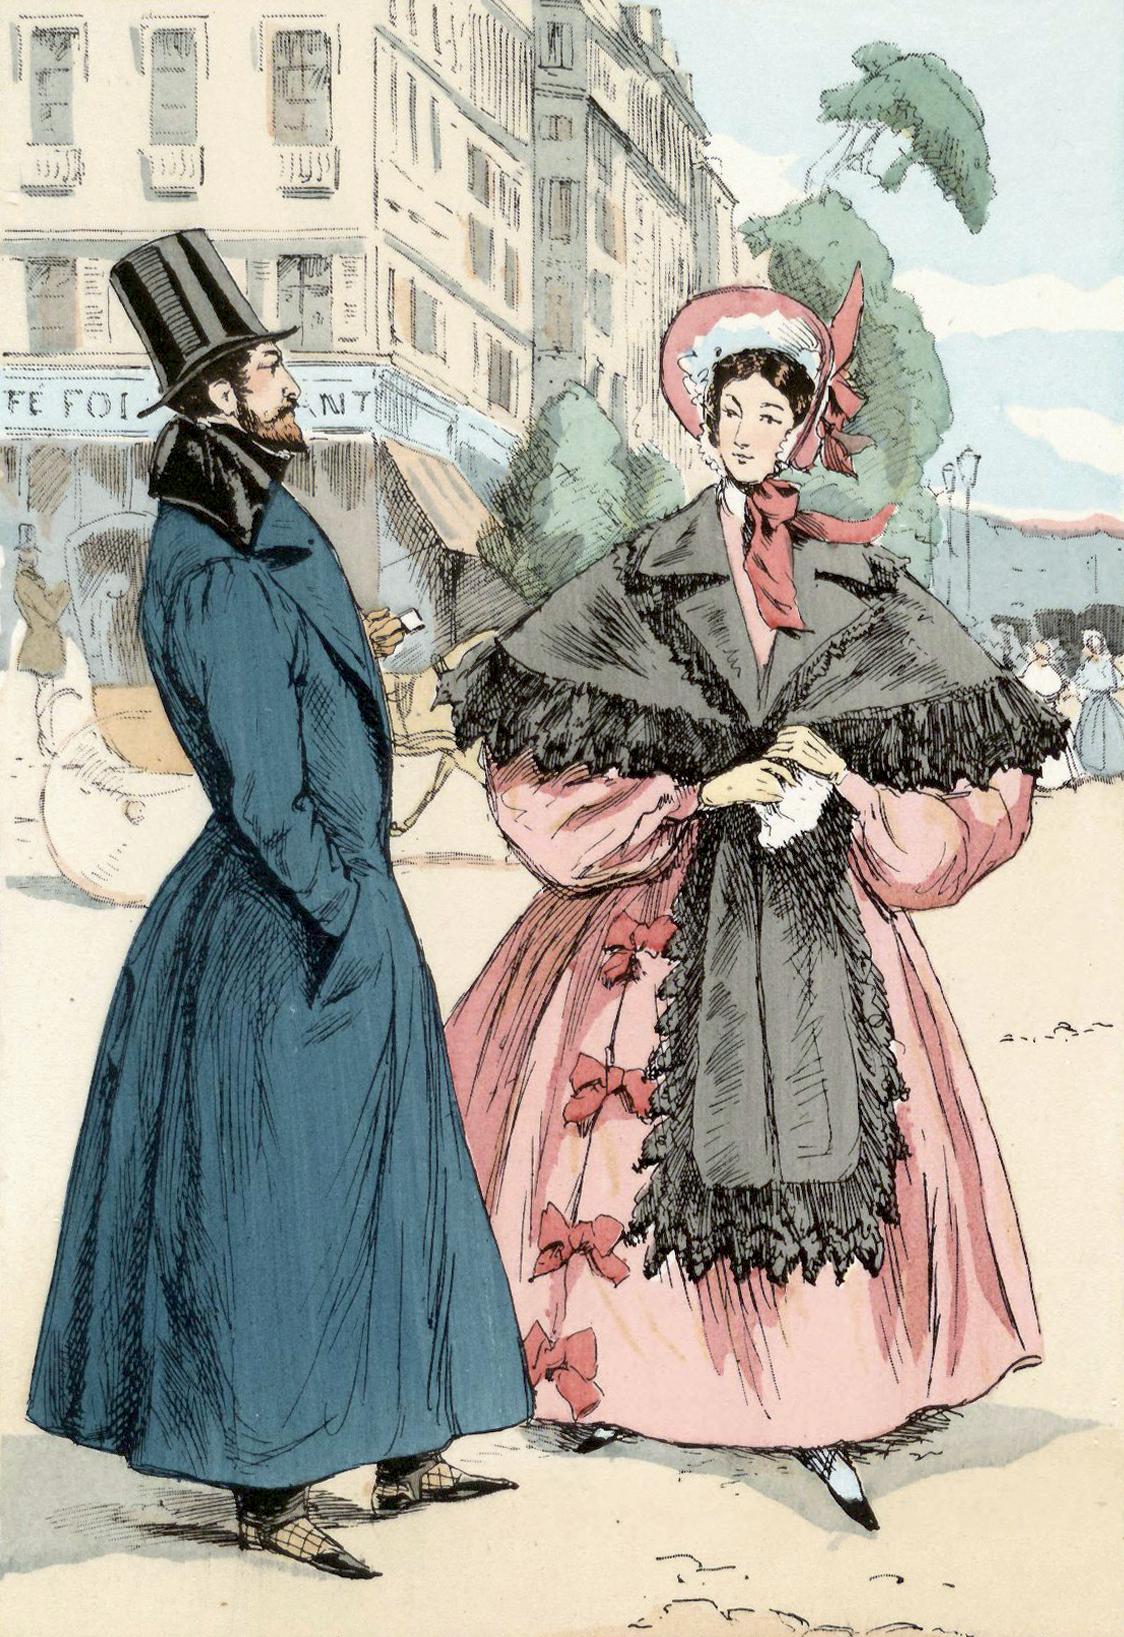 File:Boulevard des Italiens, Paris, 1833.jpg